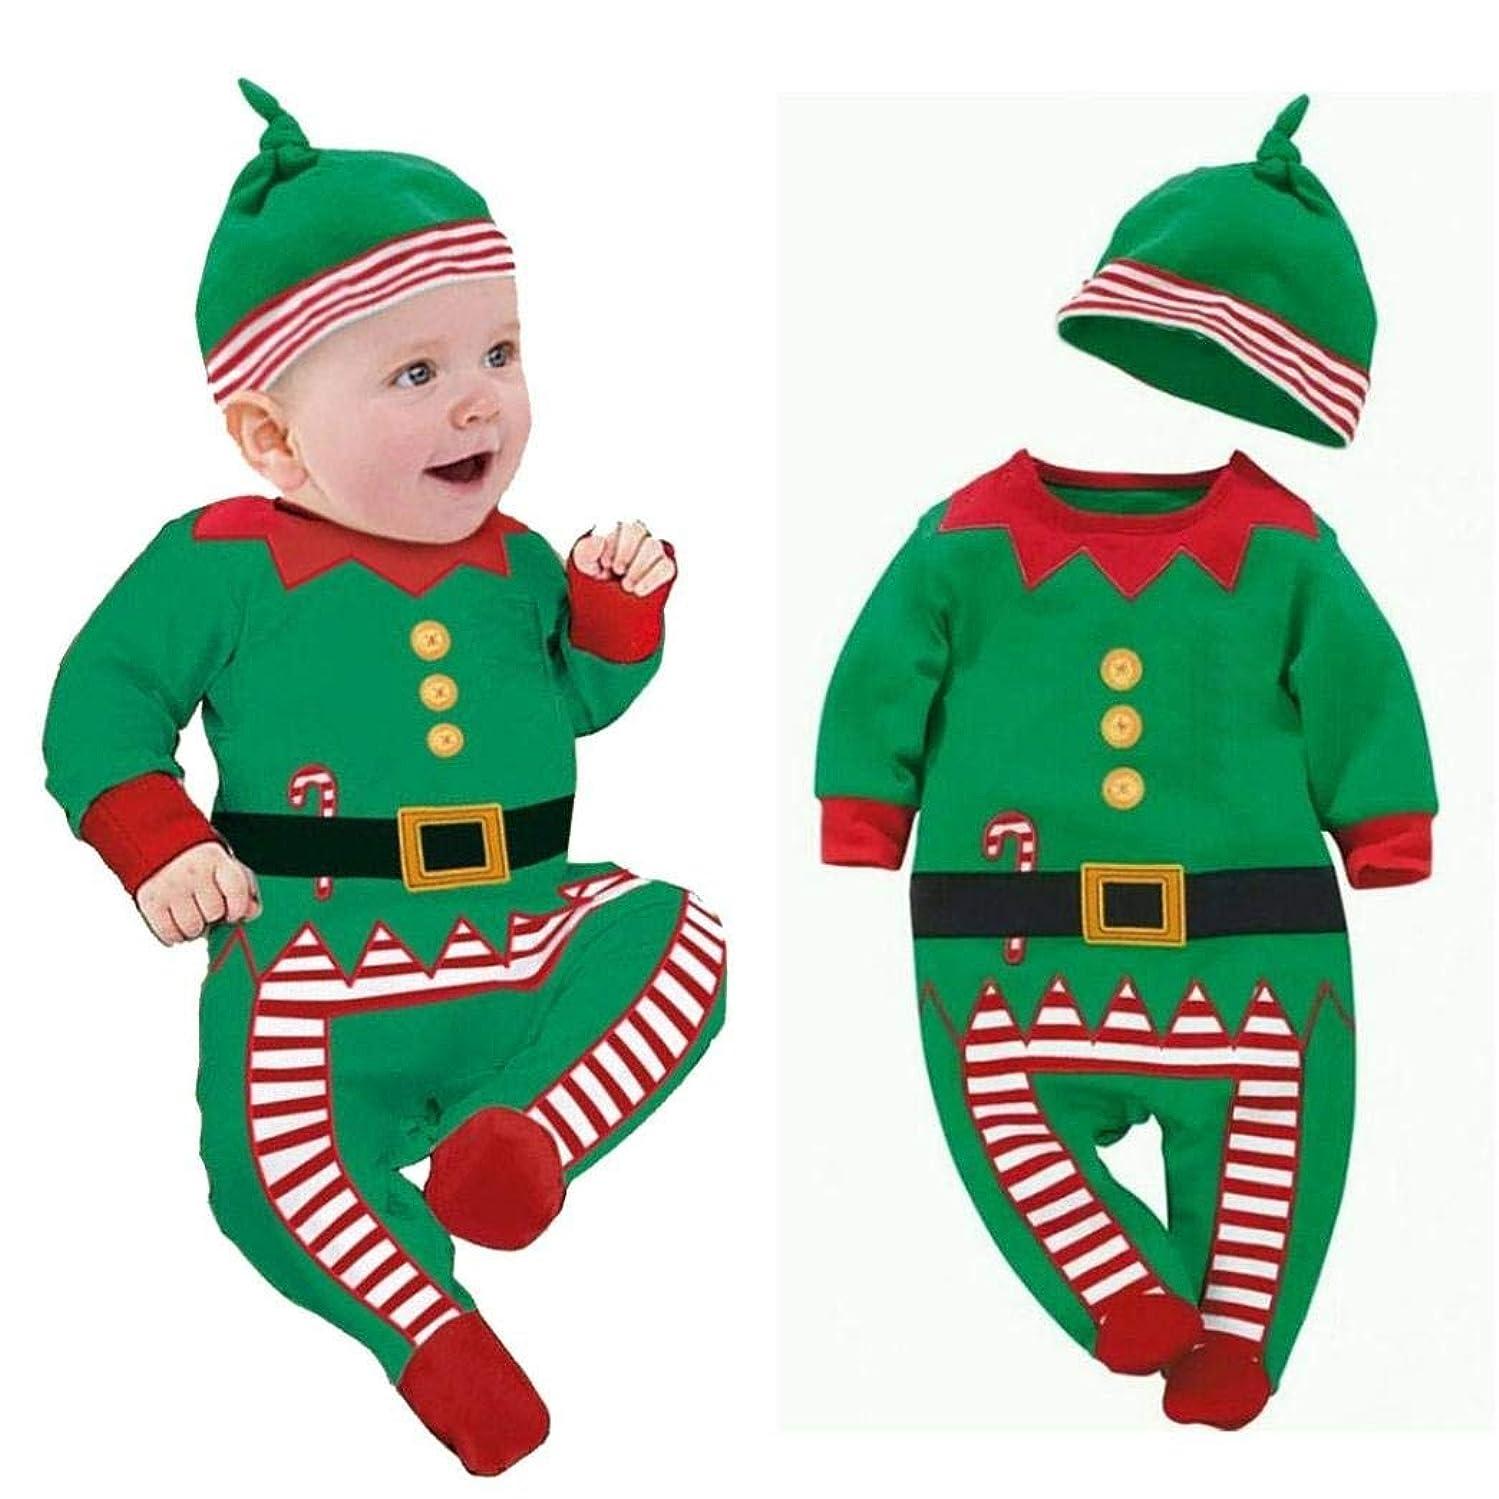 Gotd Newborn Baby Boy Girl Romper Hat Cap Photo Outfits Christmas Gift